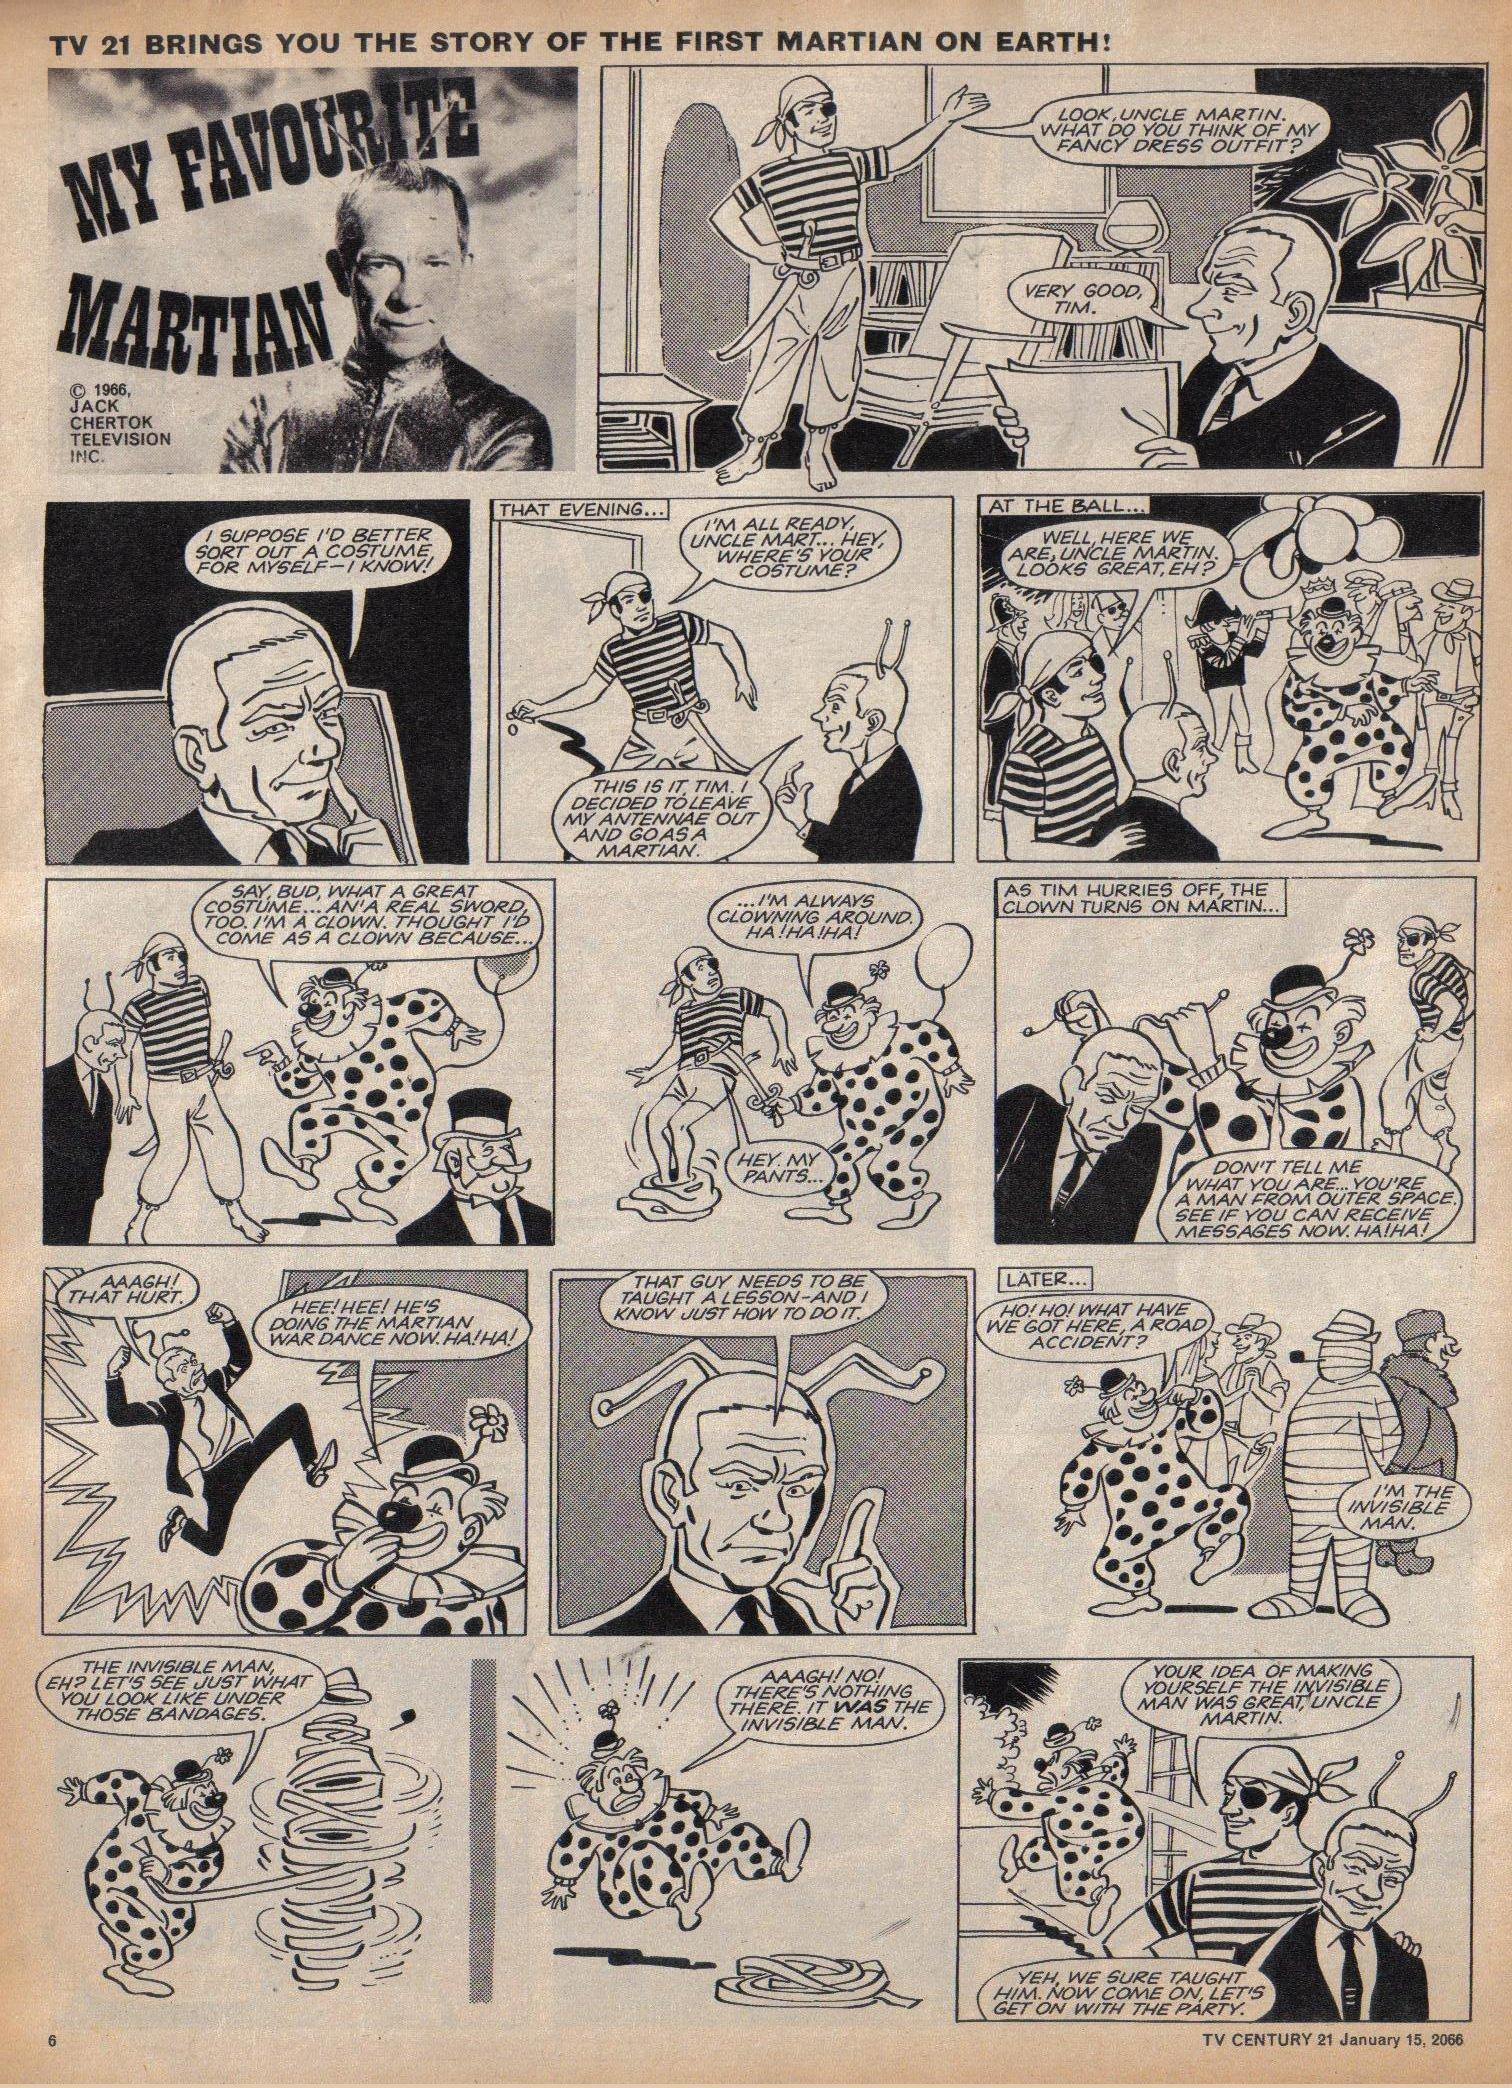 Read online TV Century 21 (TV 21) comic -  Issue #52 - 6